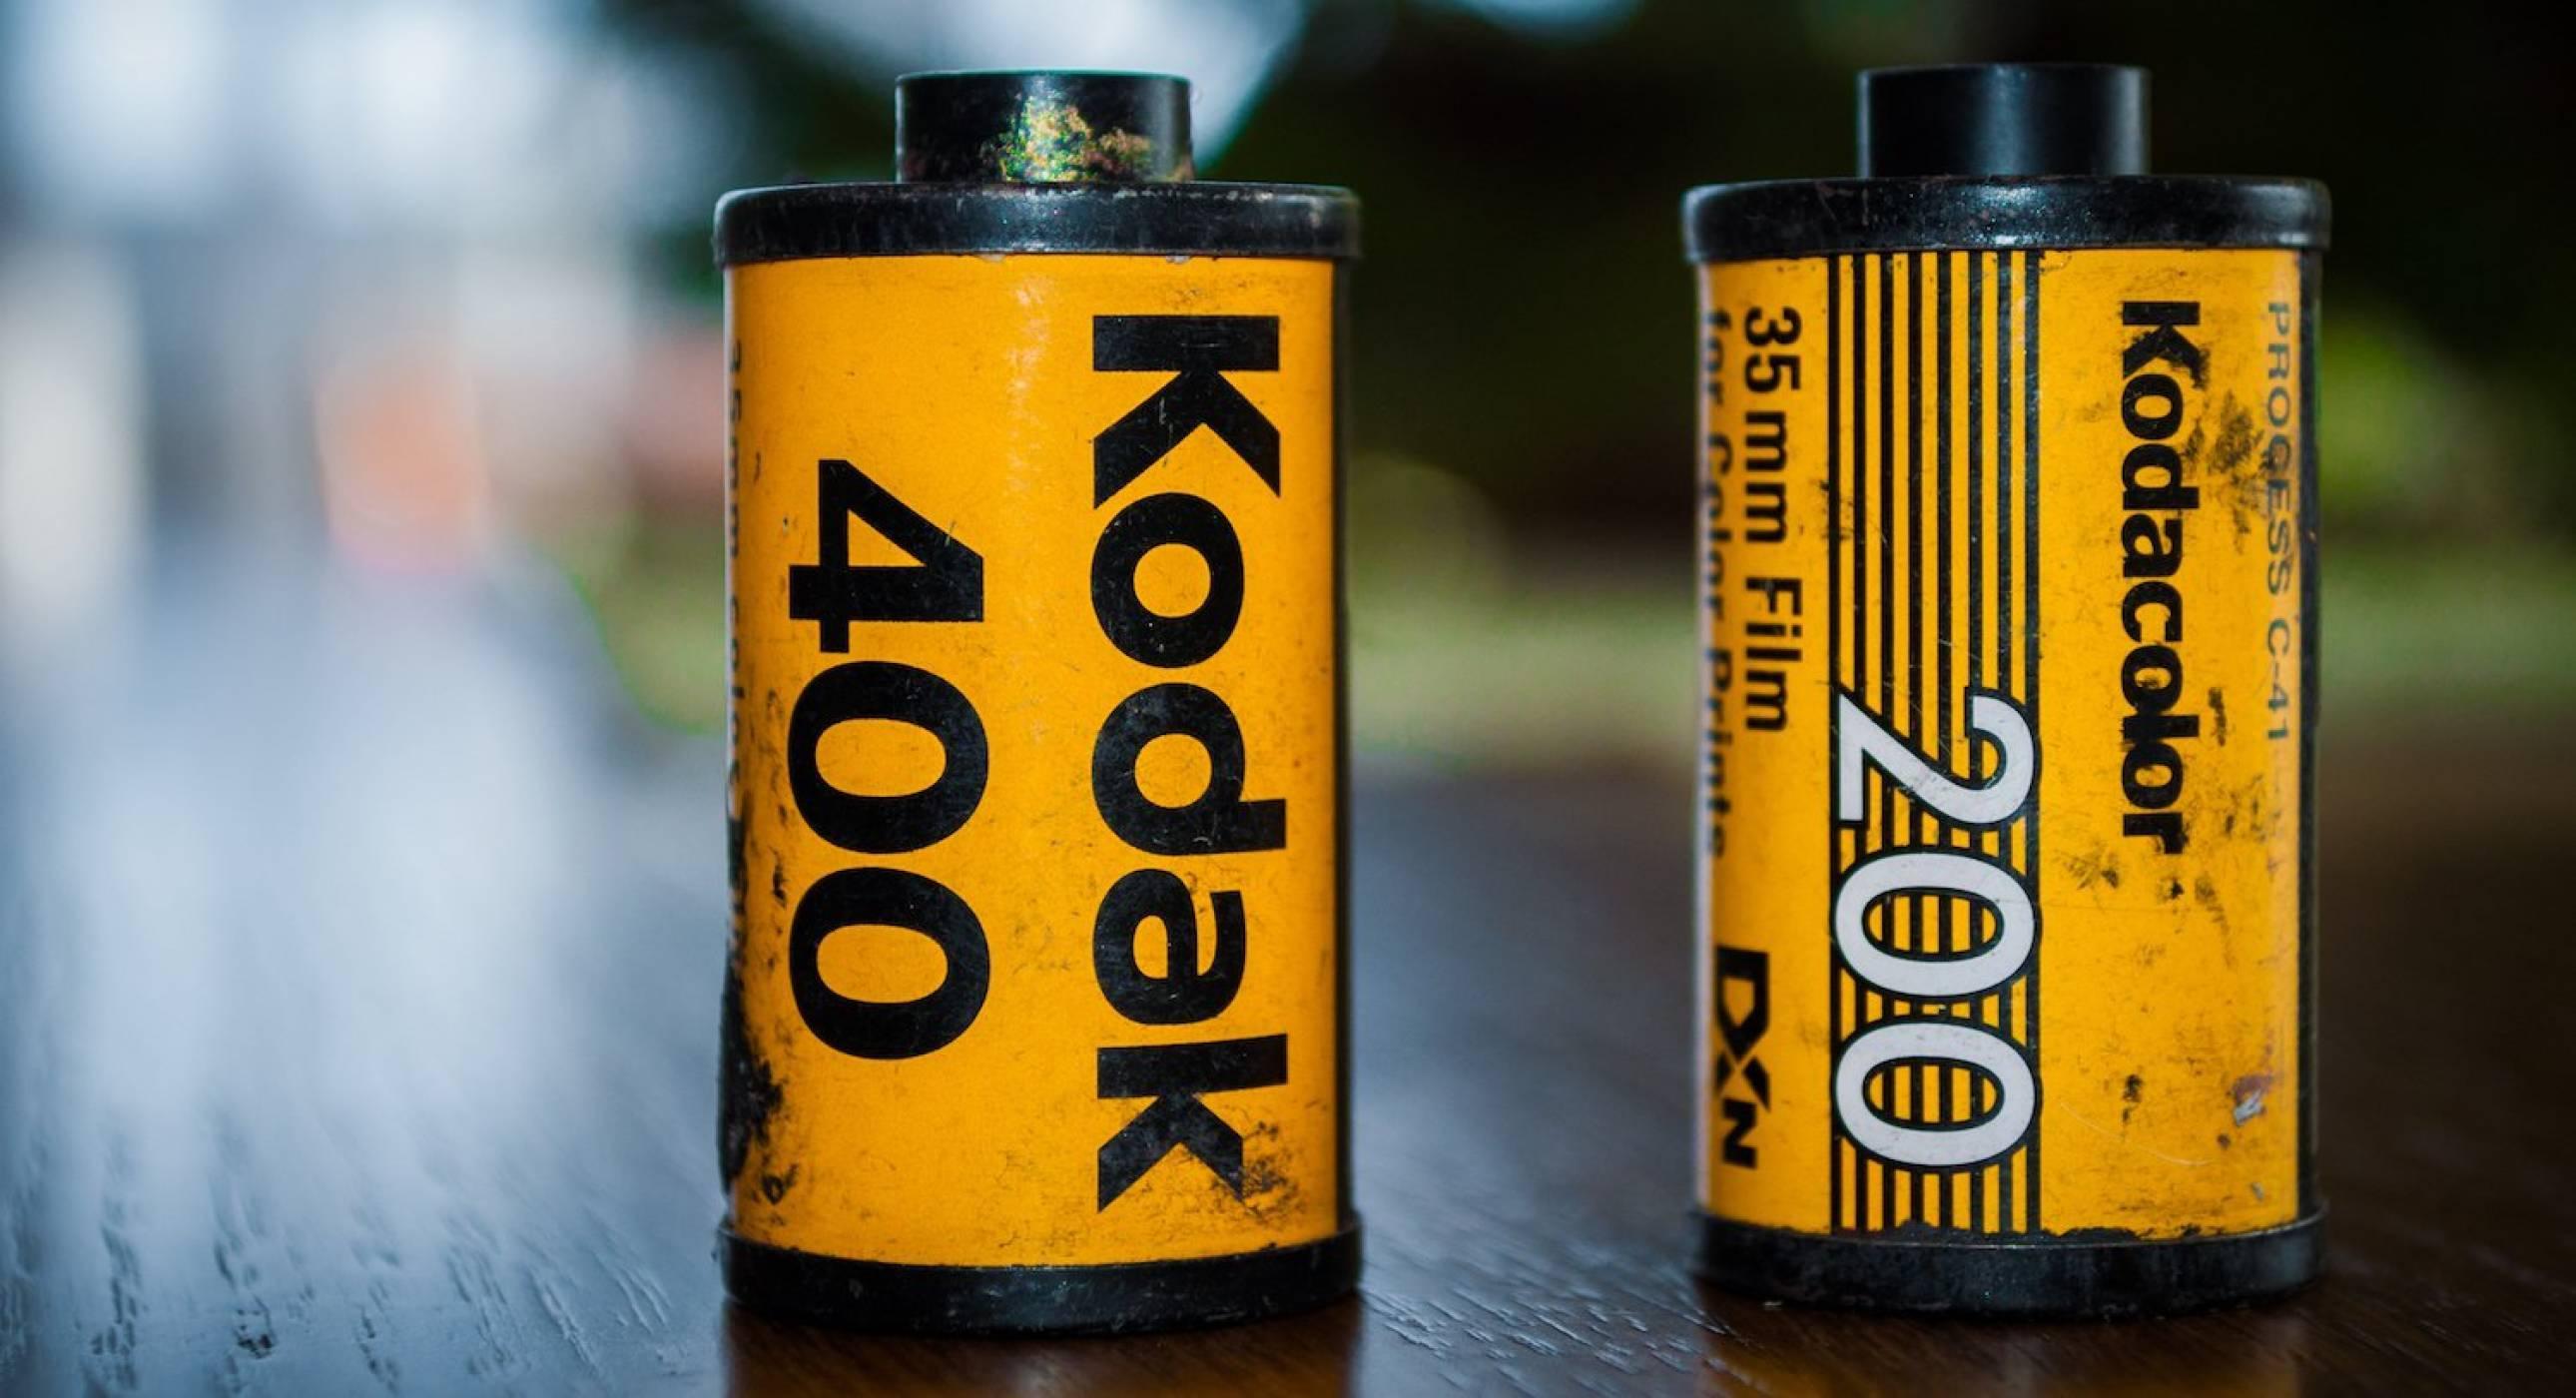 Kodak обяви нова криптовалута и акциите ѝ скочиха тройно